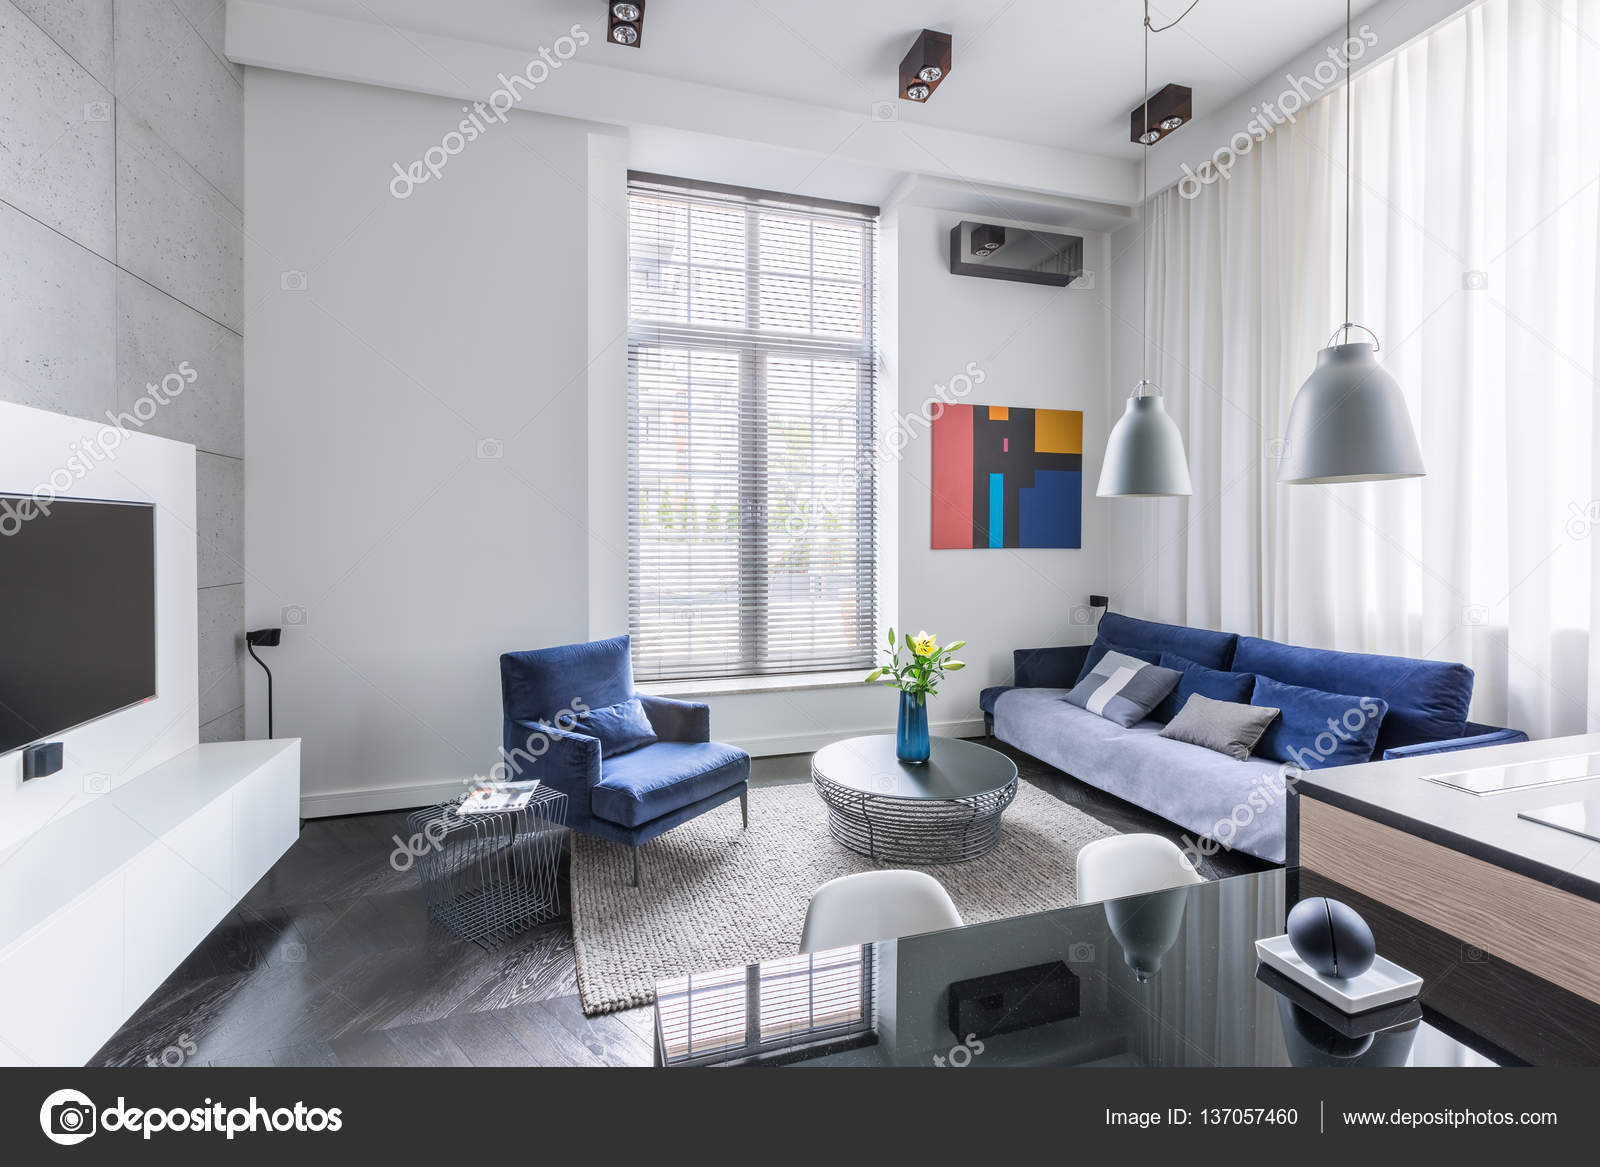 Industrial living room design — Stock Photo © in4mal #137057460